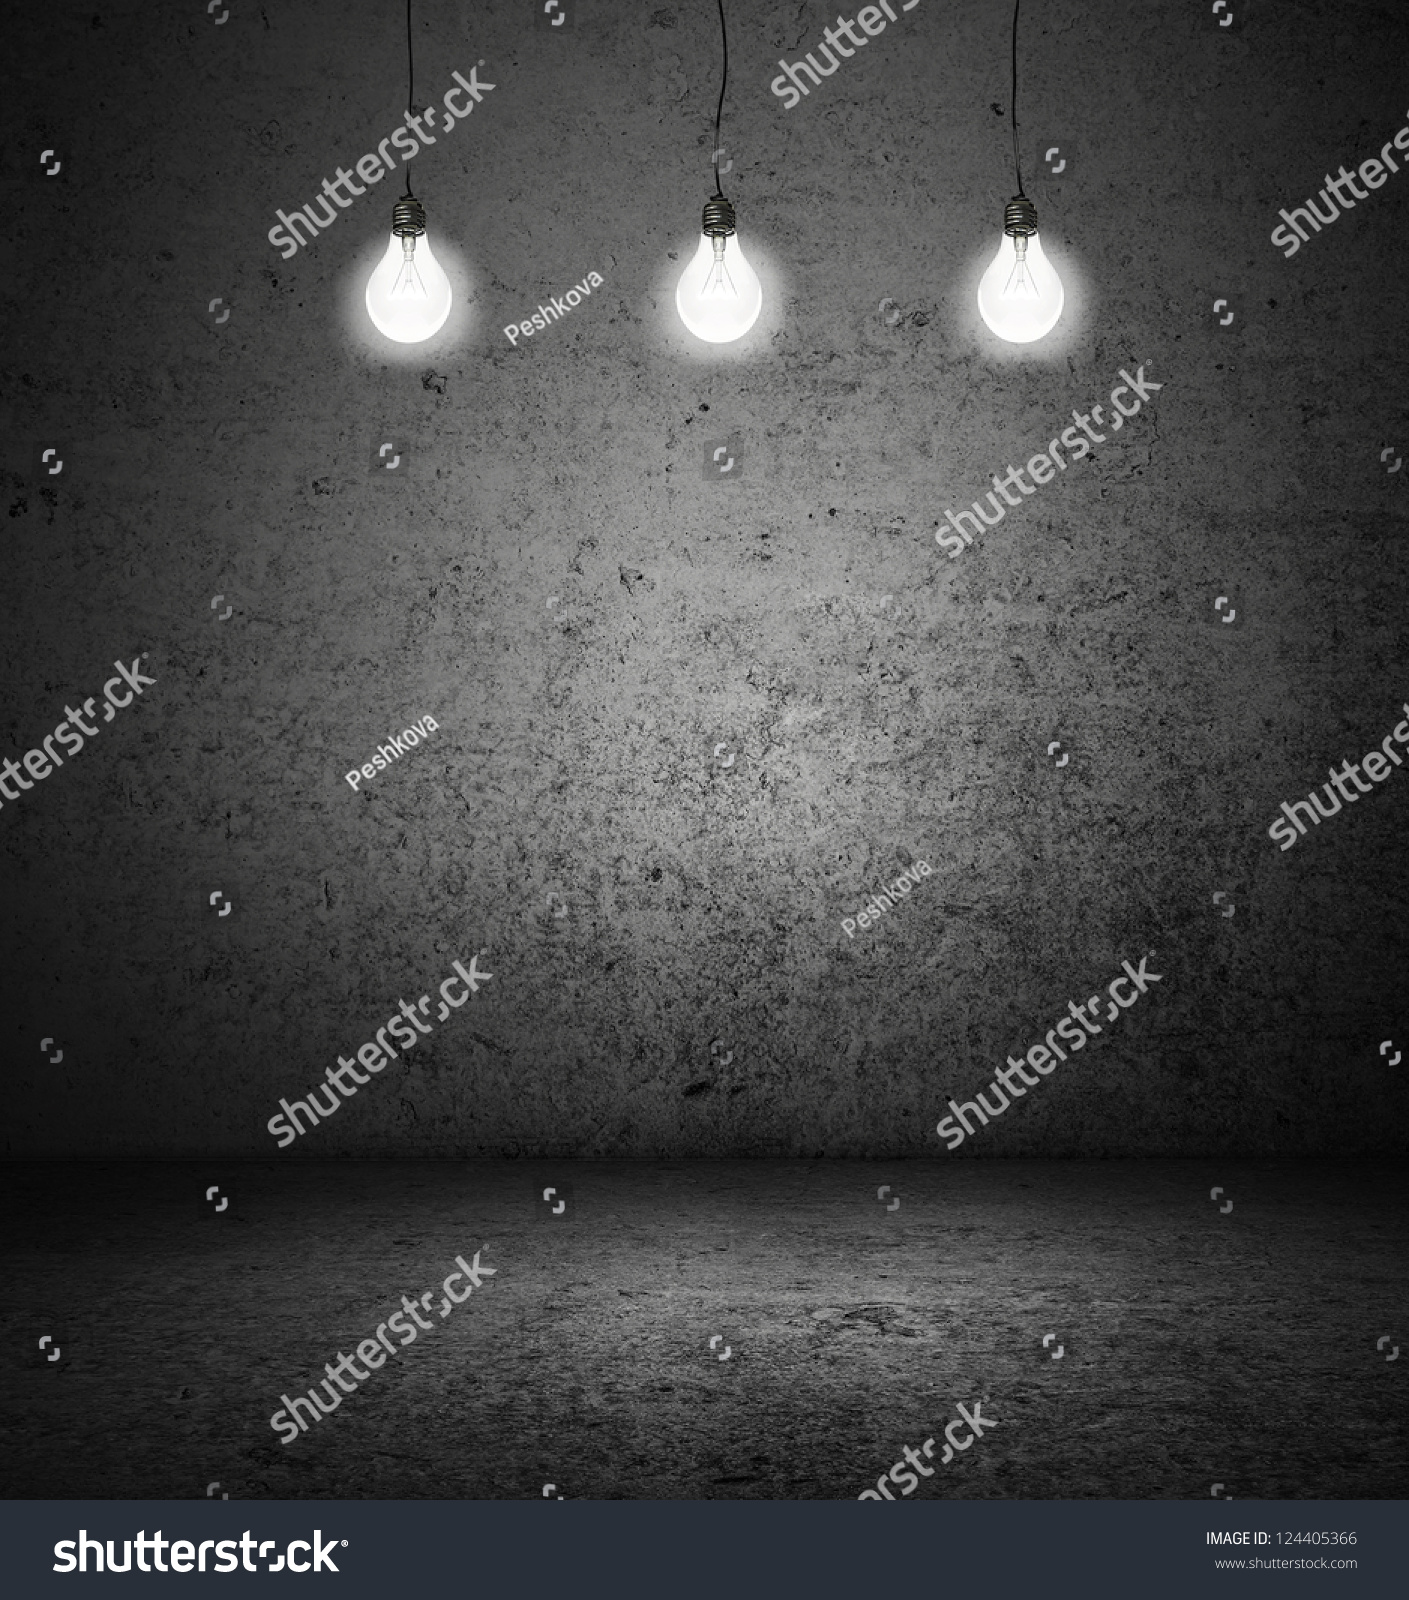 monica photography bulb about marie bulbs discover wallpaper on bear by light ideas diy minimalist photo pinterest pin